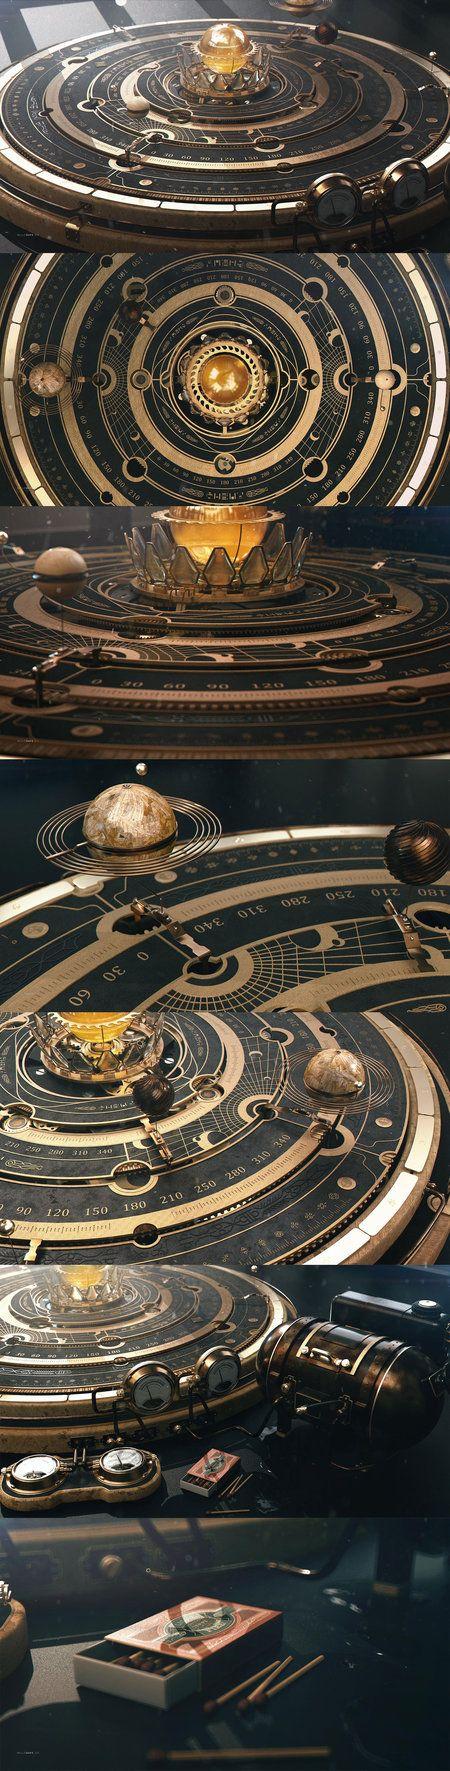 Steampunk Astrolabe Orrery Table by dchan.deviantart.com on @DeviantArt